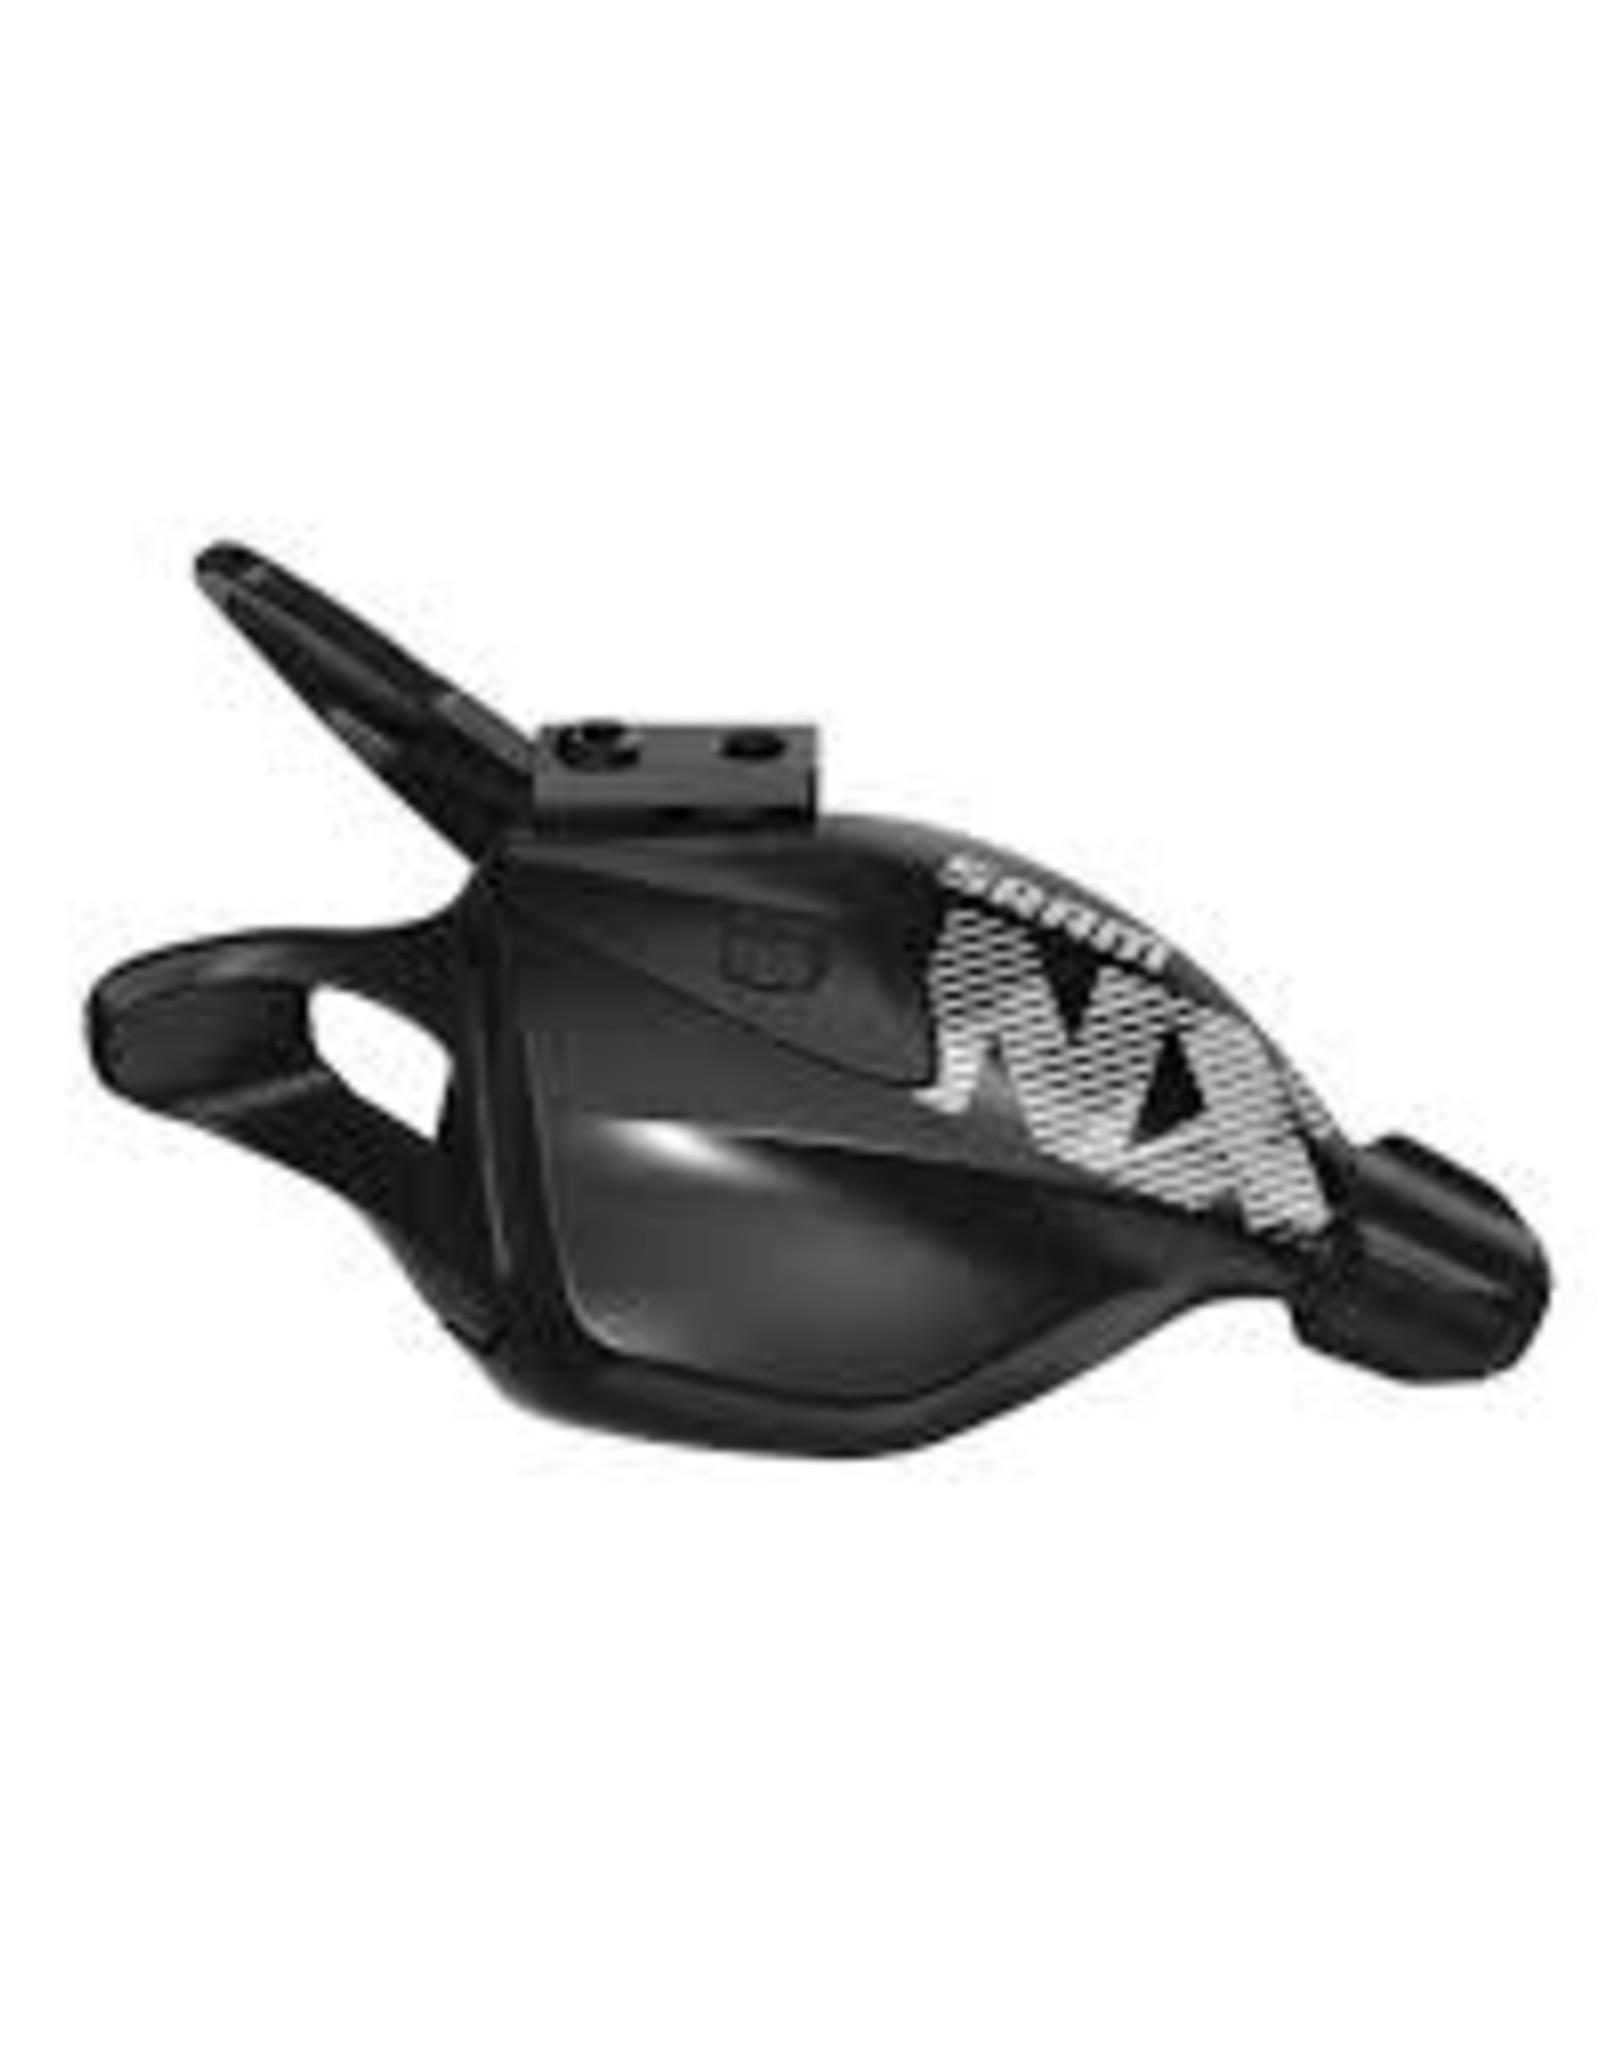 SRAM Shifter SRAM NX Eagle 12-Speed w/ Discrete Clamp